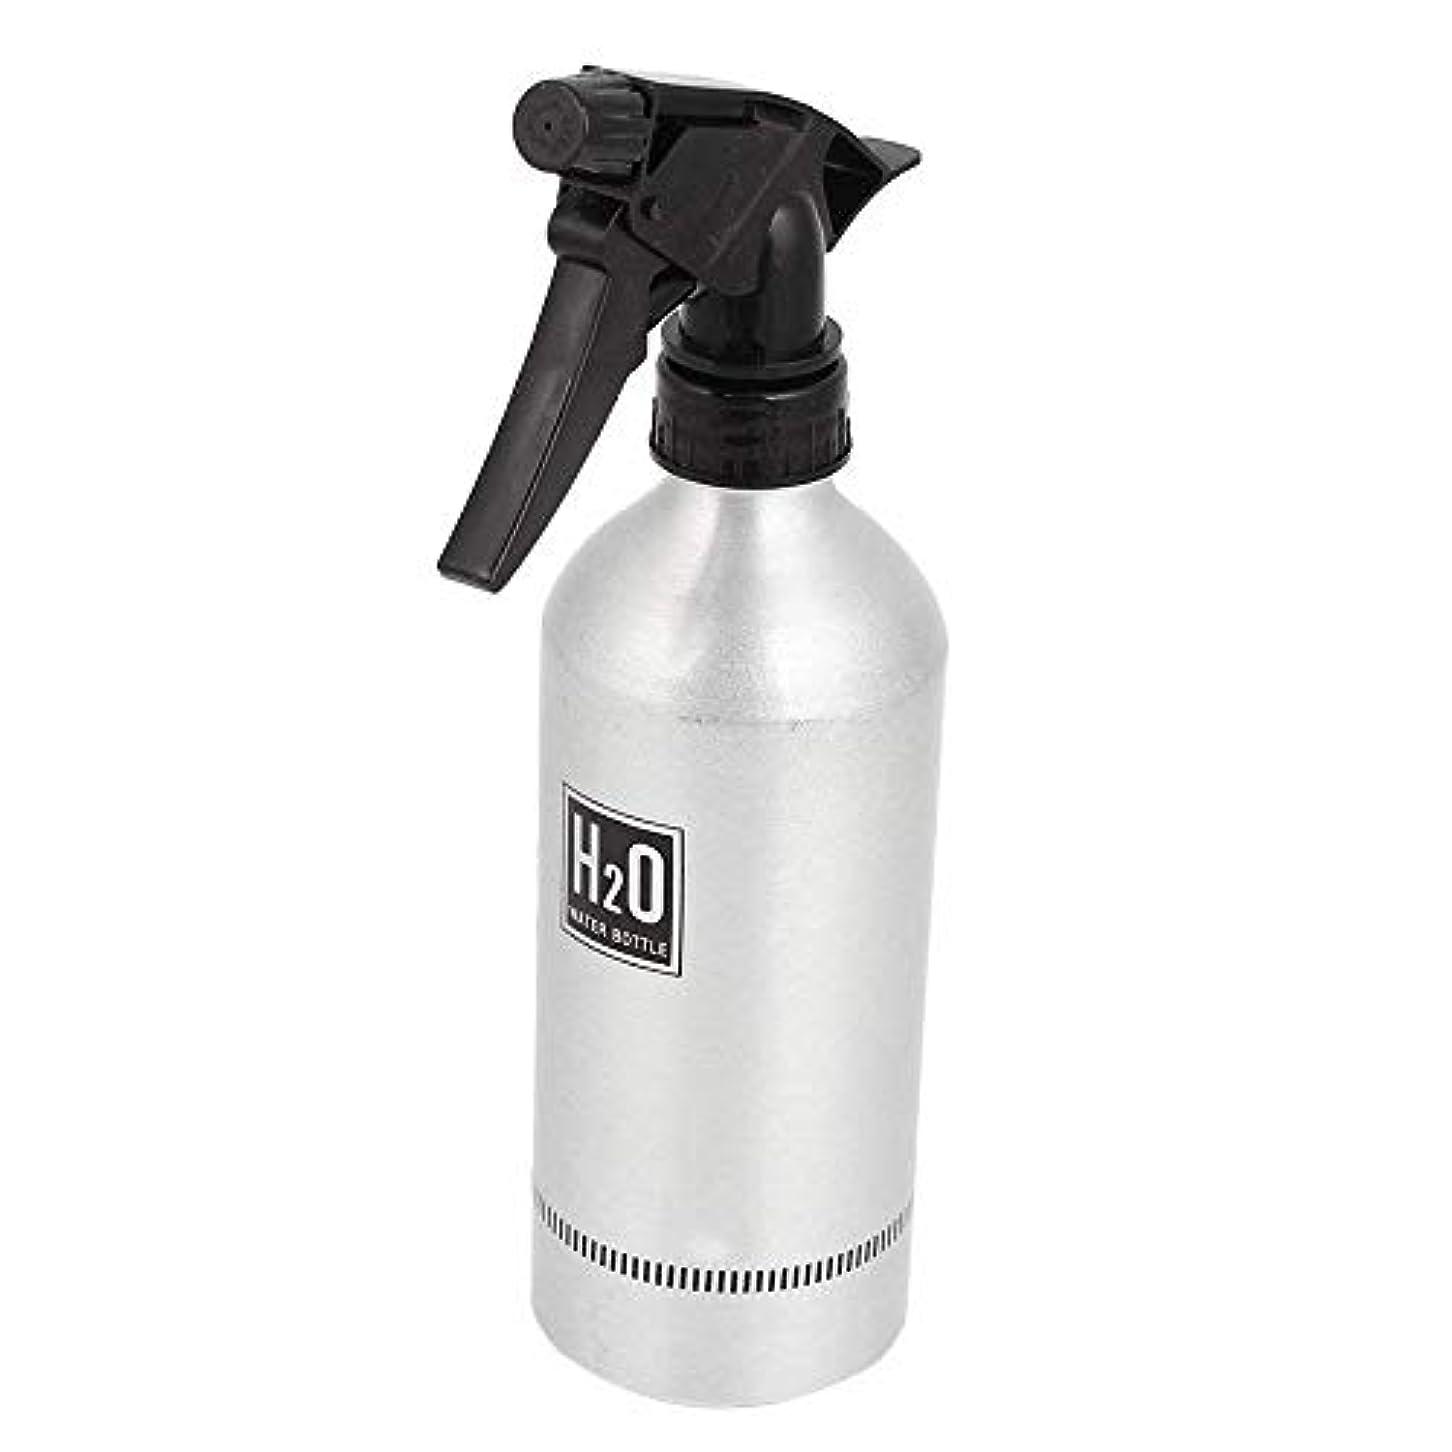 Onior アルミ スプレー缶 水髪器 スプレー スプレーボトル 美容ツール サロン 理髪師 美容師 清潔 クリーニング 500ミリリットル